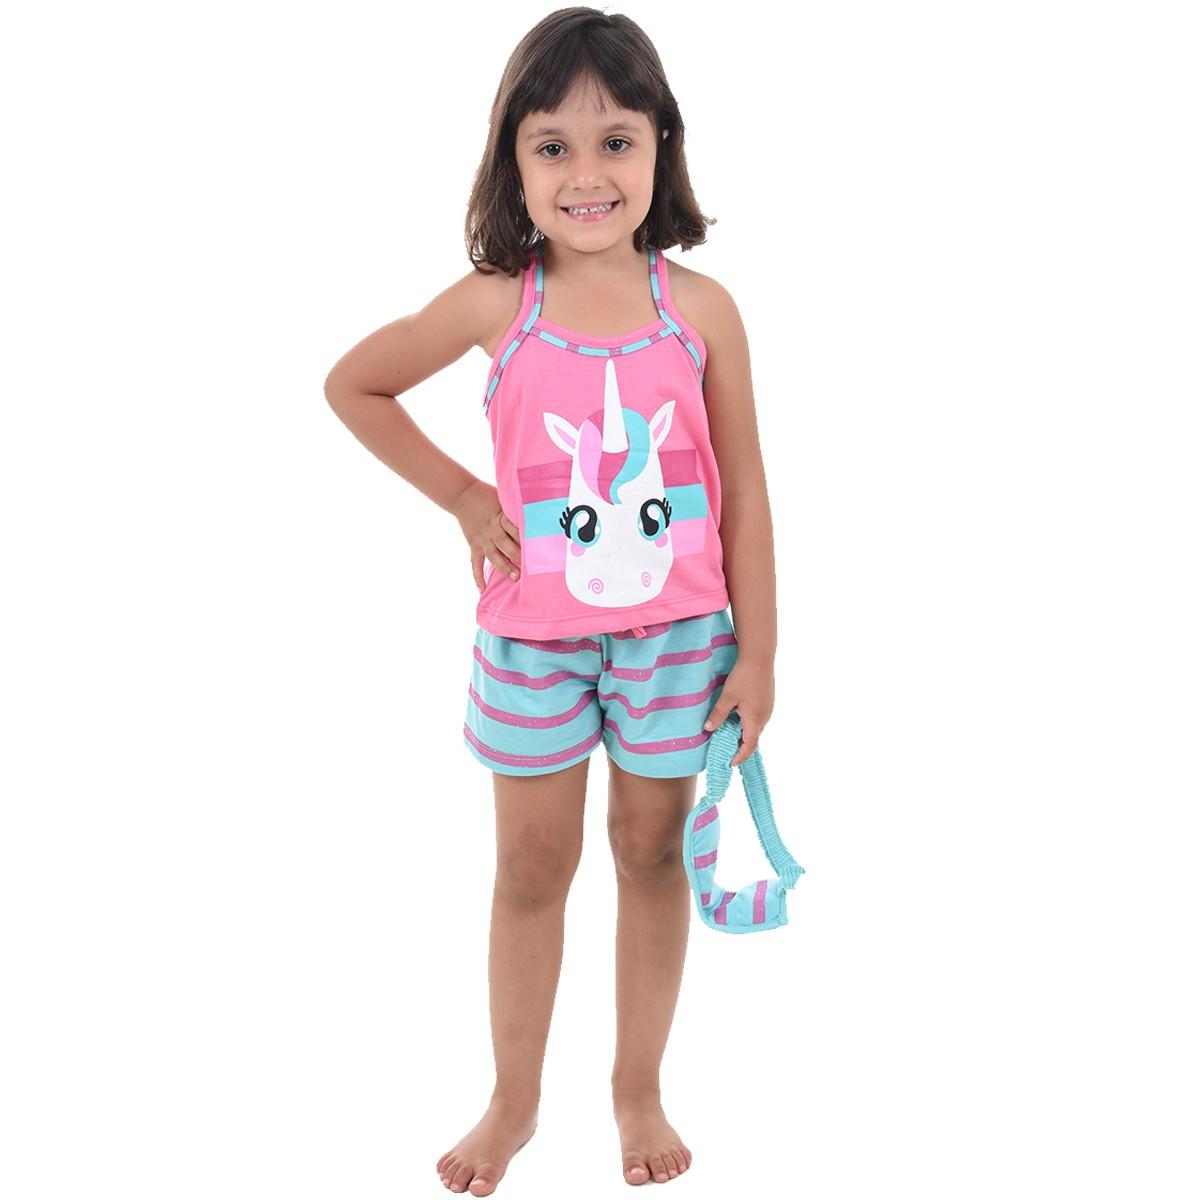 Baby Doll Short Doll Alça Feminino Infantil Menina C/ Tapa Olho Unicórnio Ref: 318